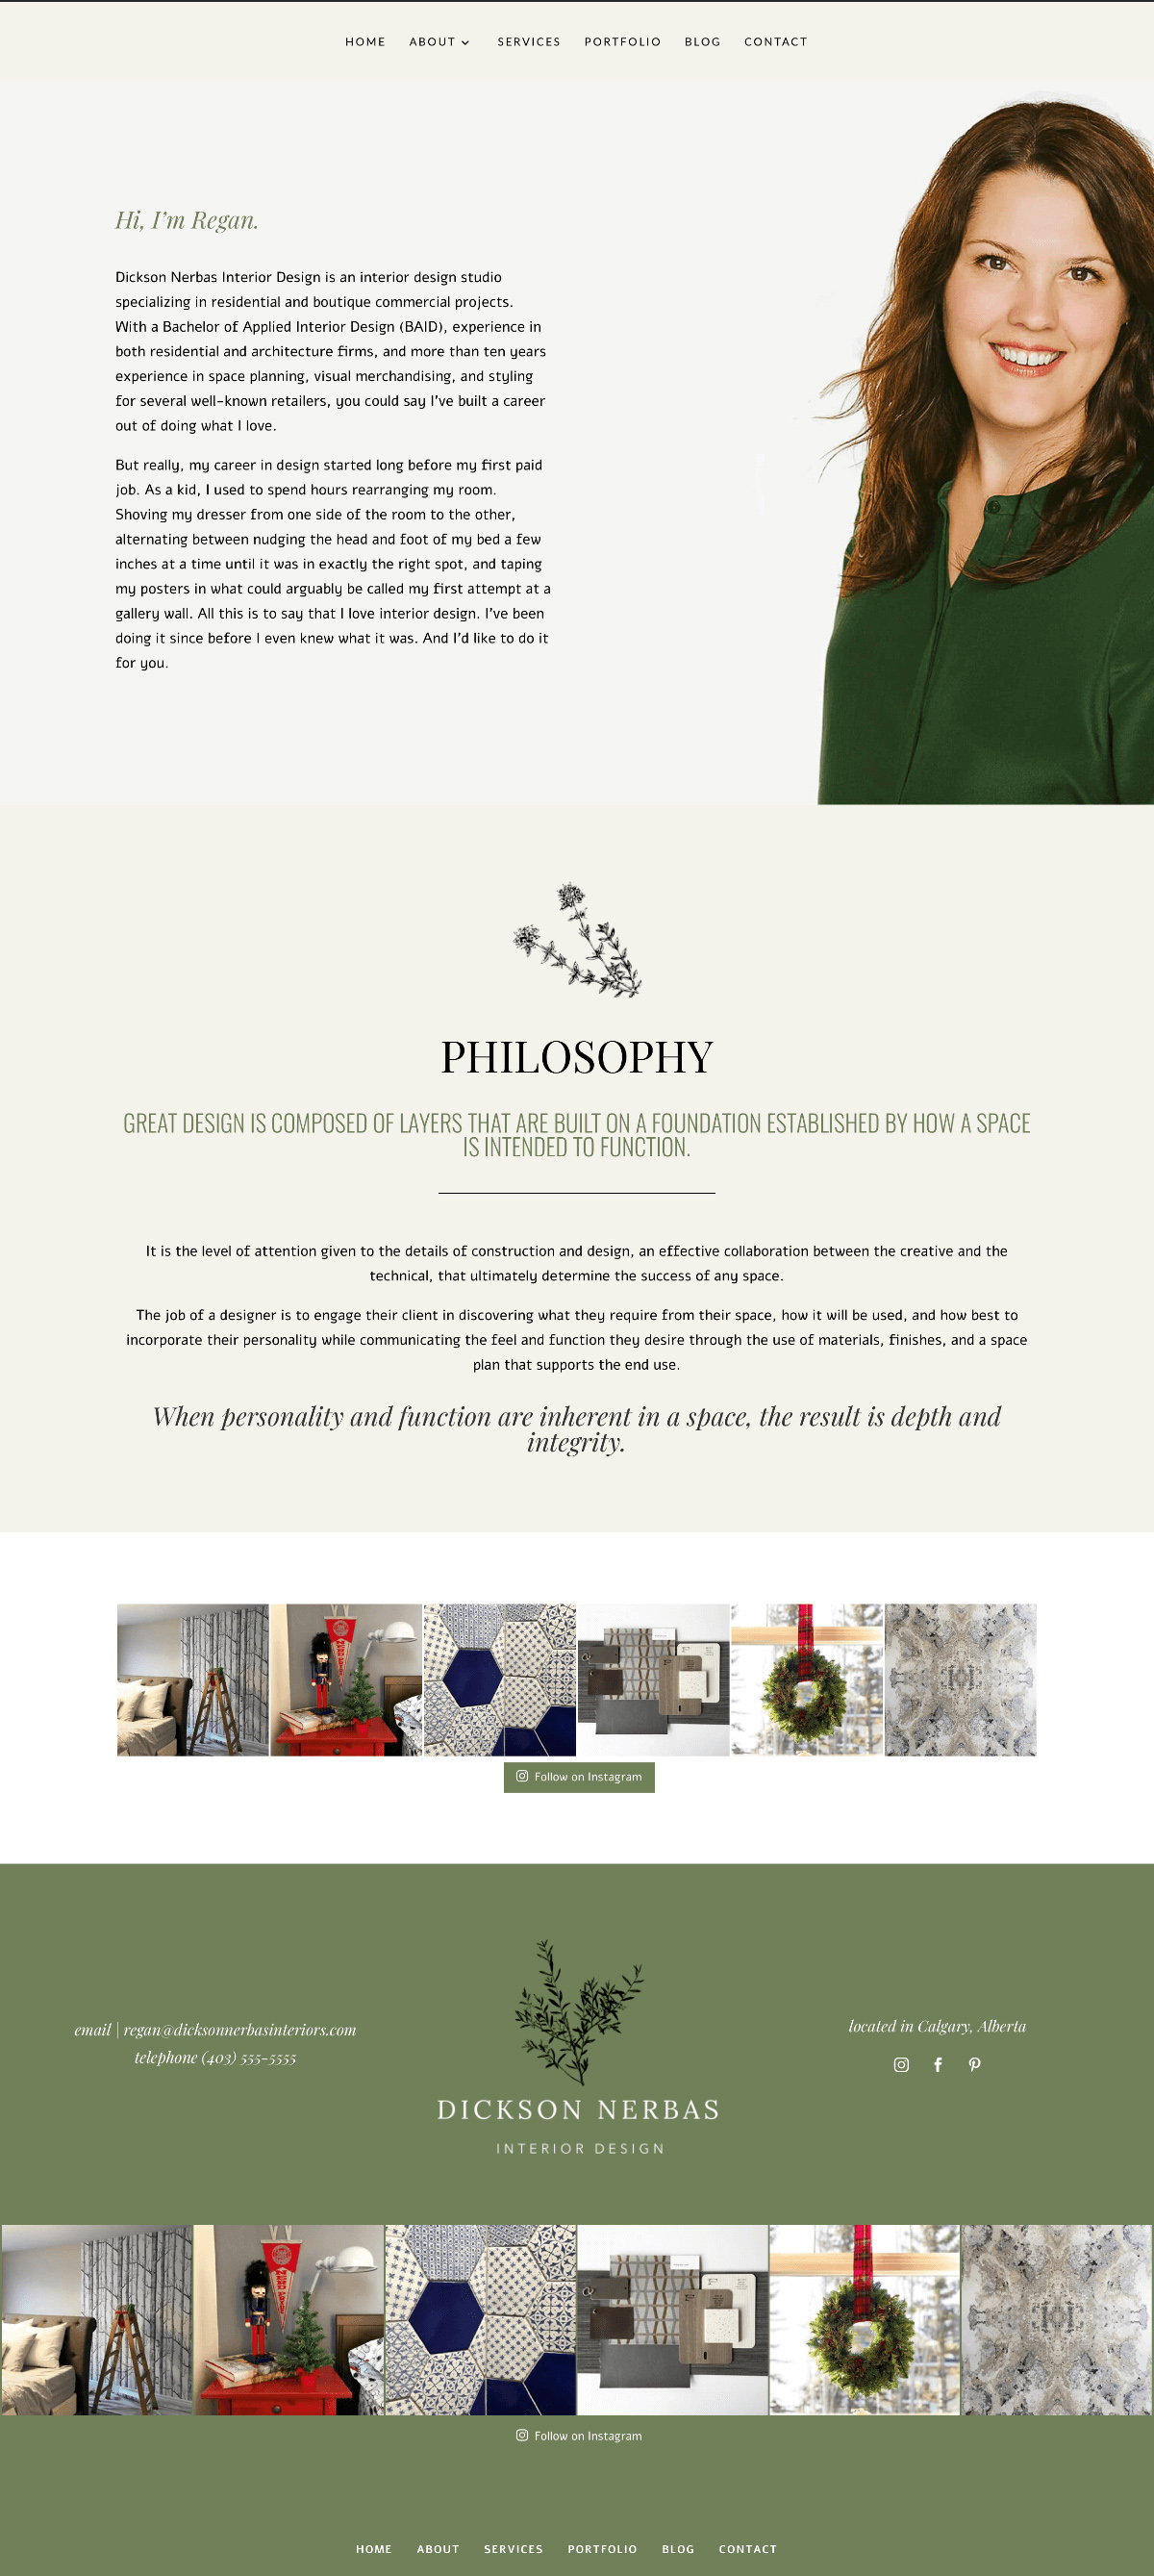 okotoks-interior-designer-website-about.jpg